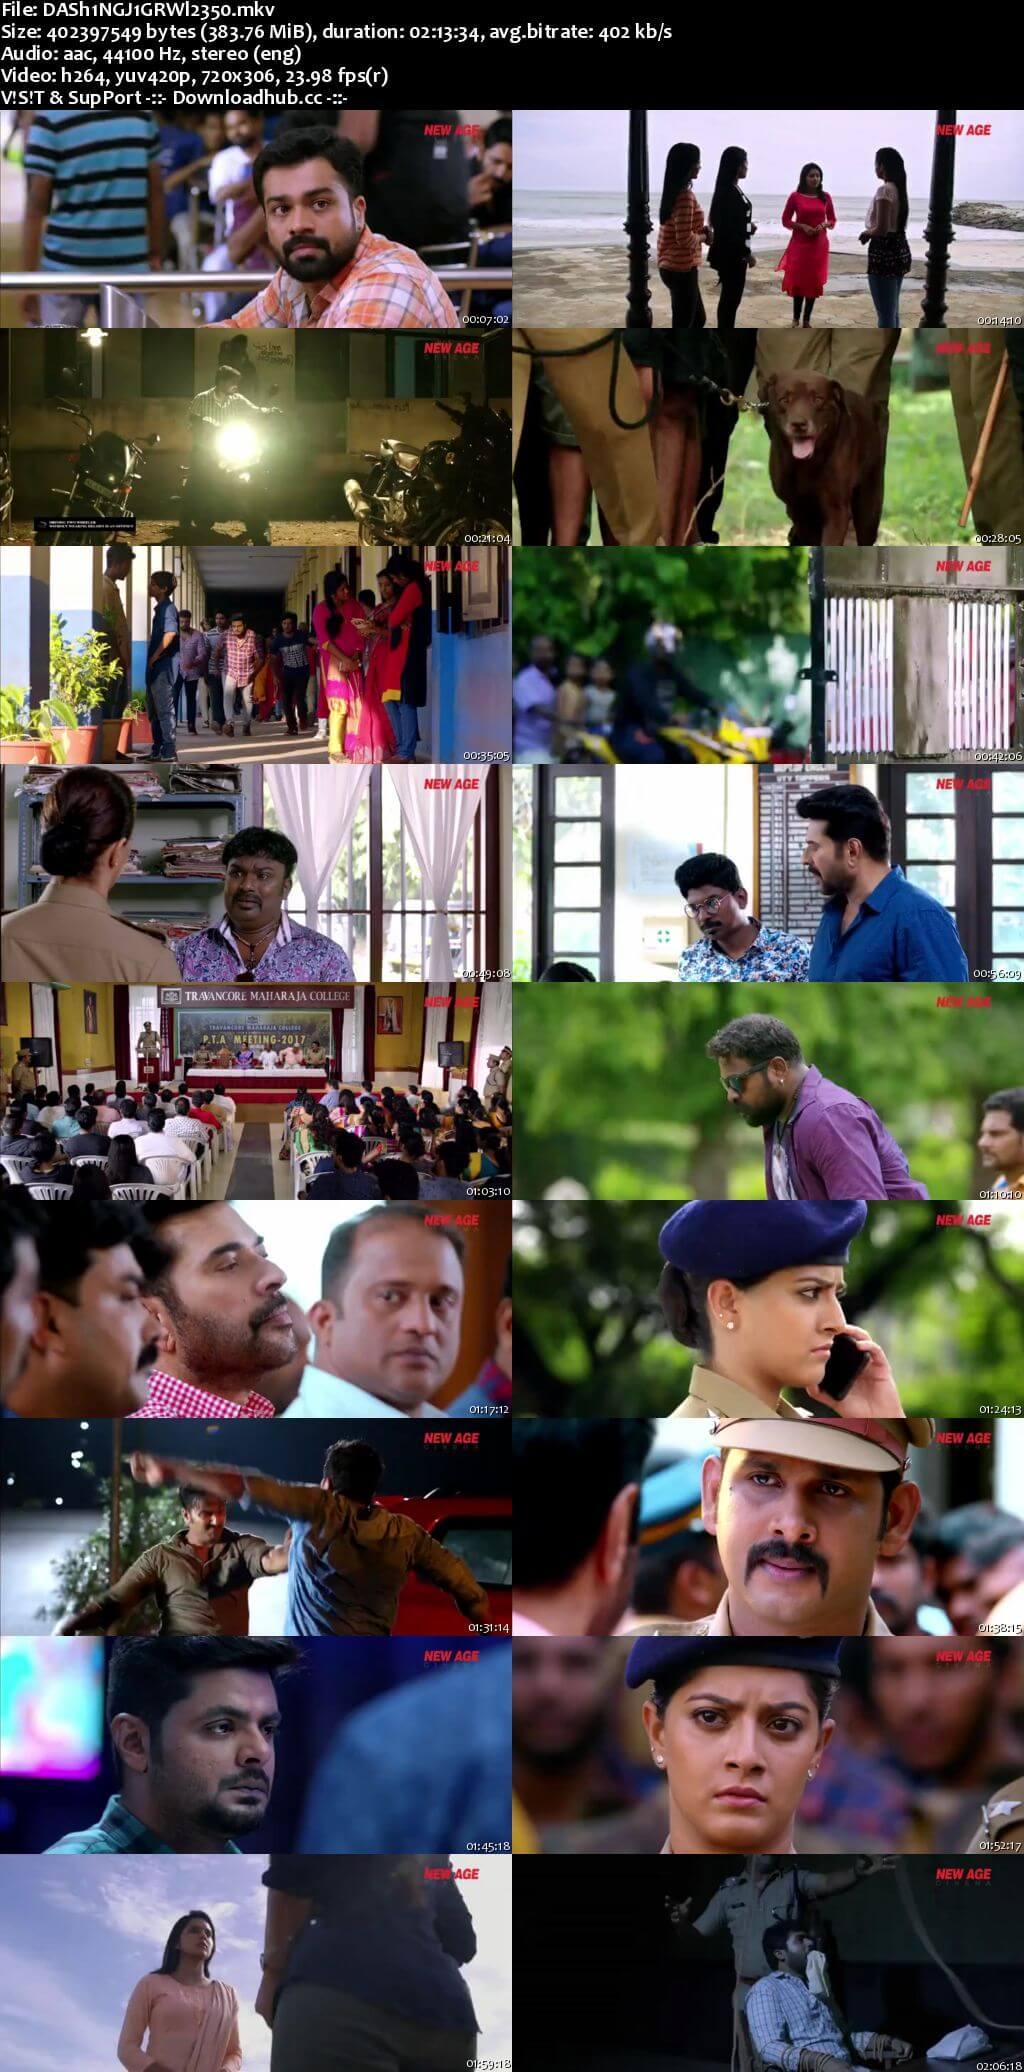 Dashing Jigarwala 2 2018 Hindi Dubbed 350MB HDRip 480p